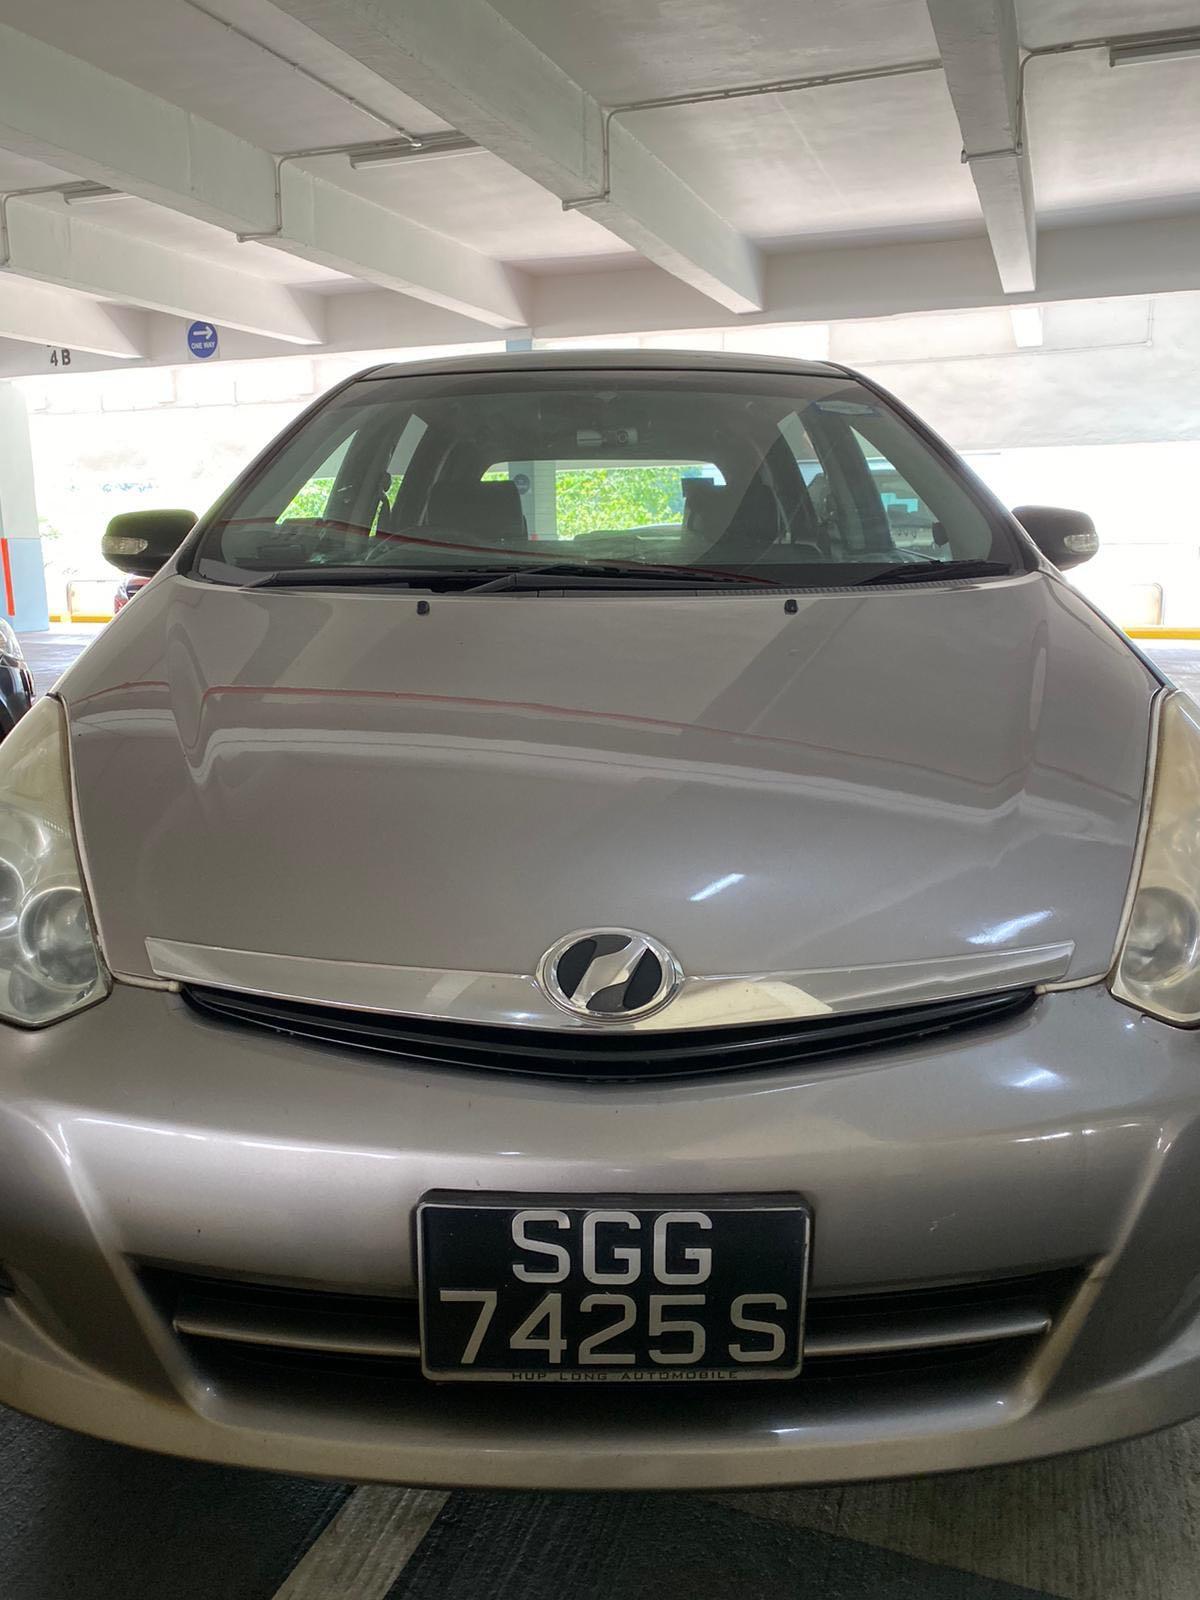 Grab/GoJek Relief Needed @ Bukit Panjang/CCK. Morning Shift. Toyota Wish 1.8A 6-Seater. Whatsapp 88567422